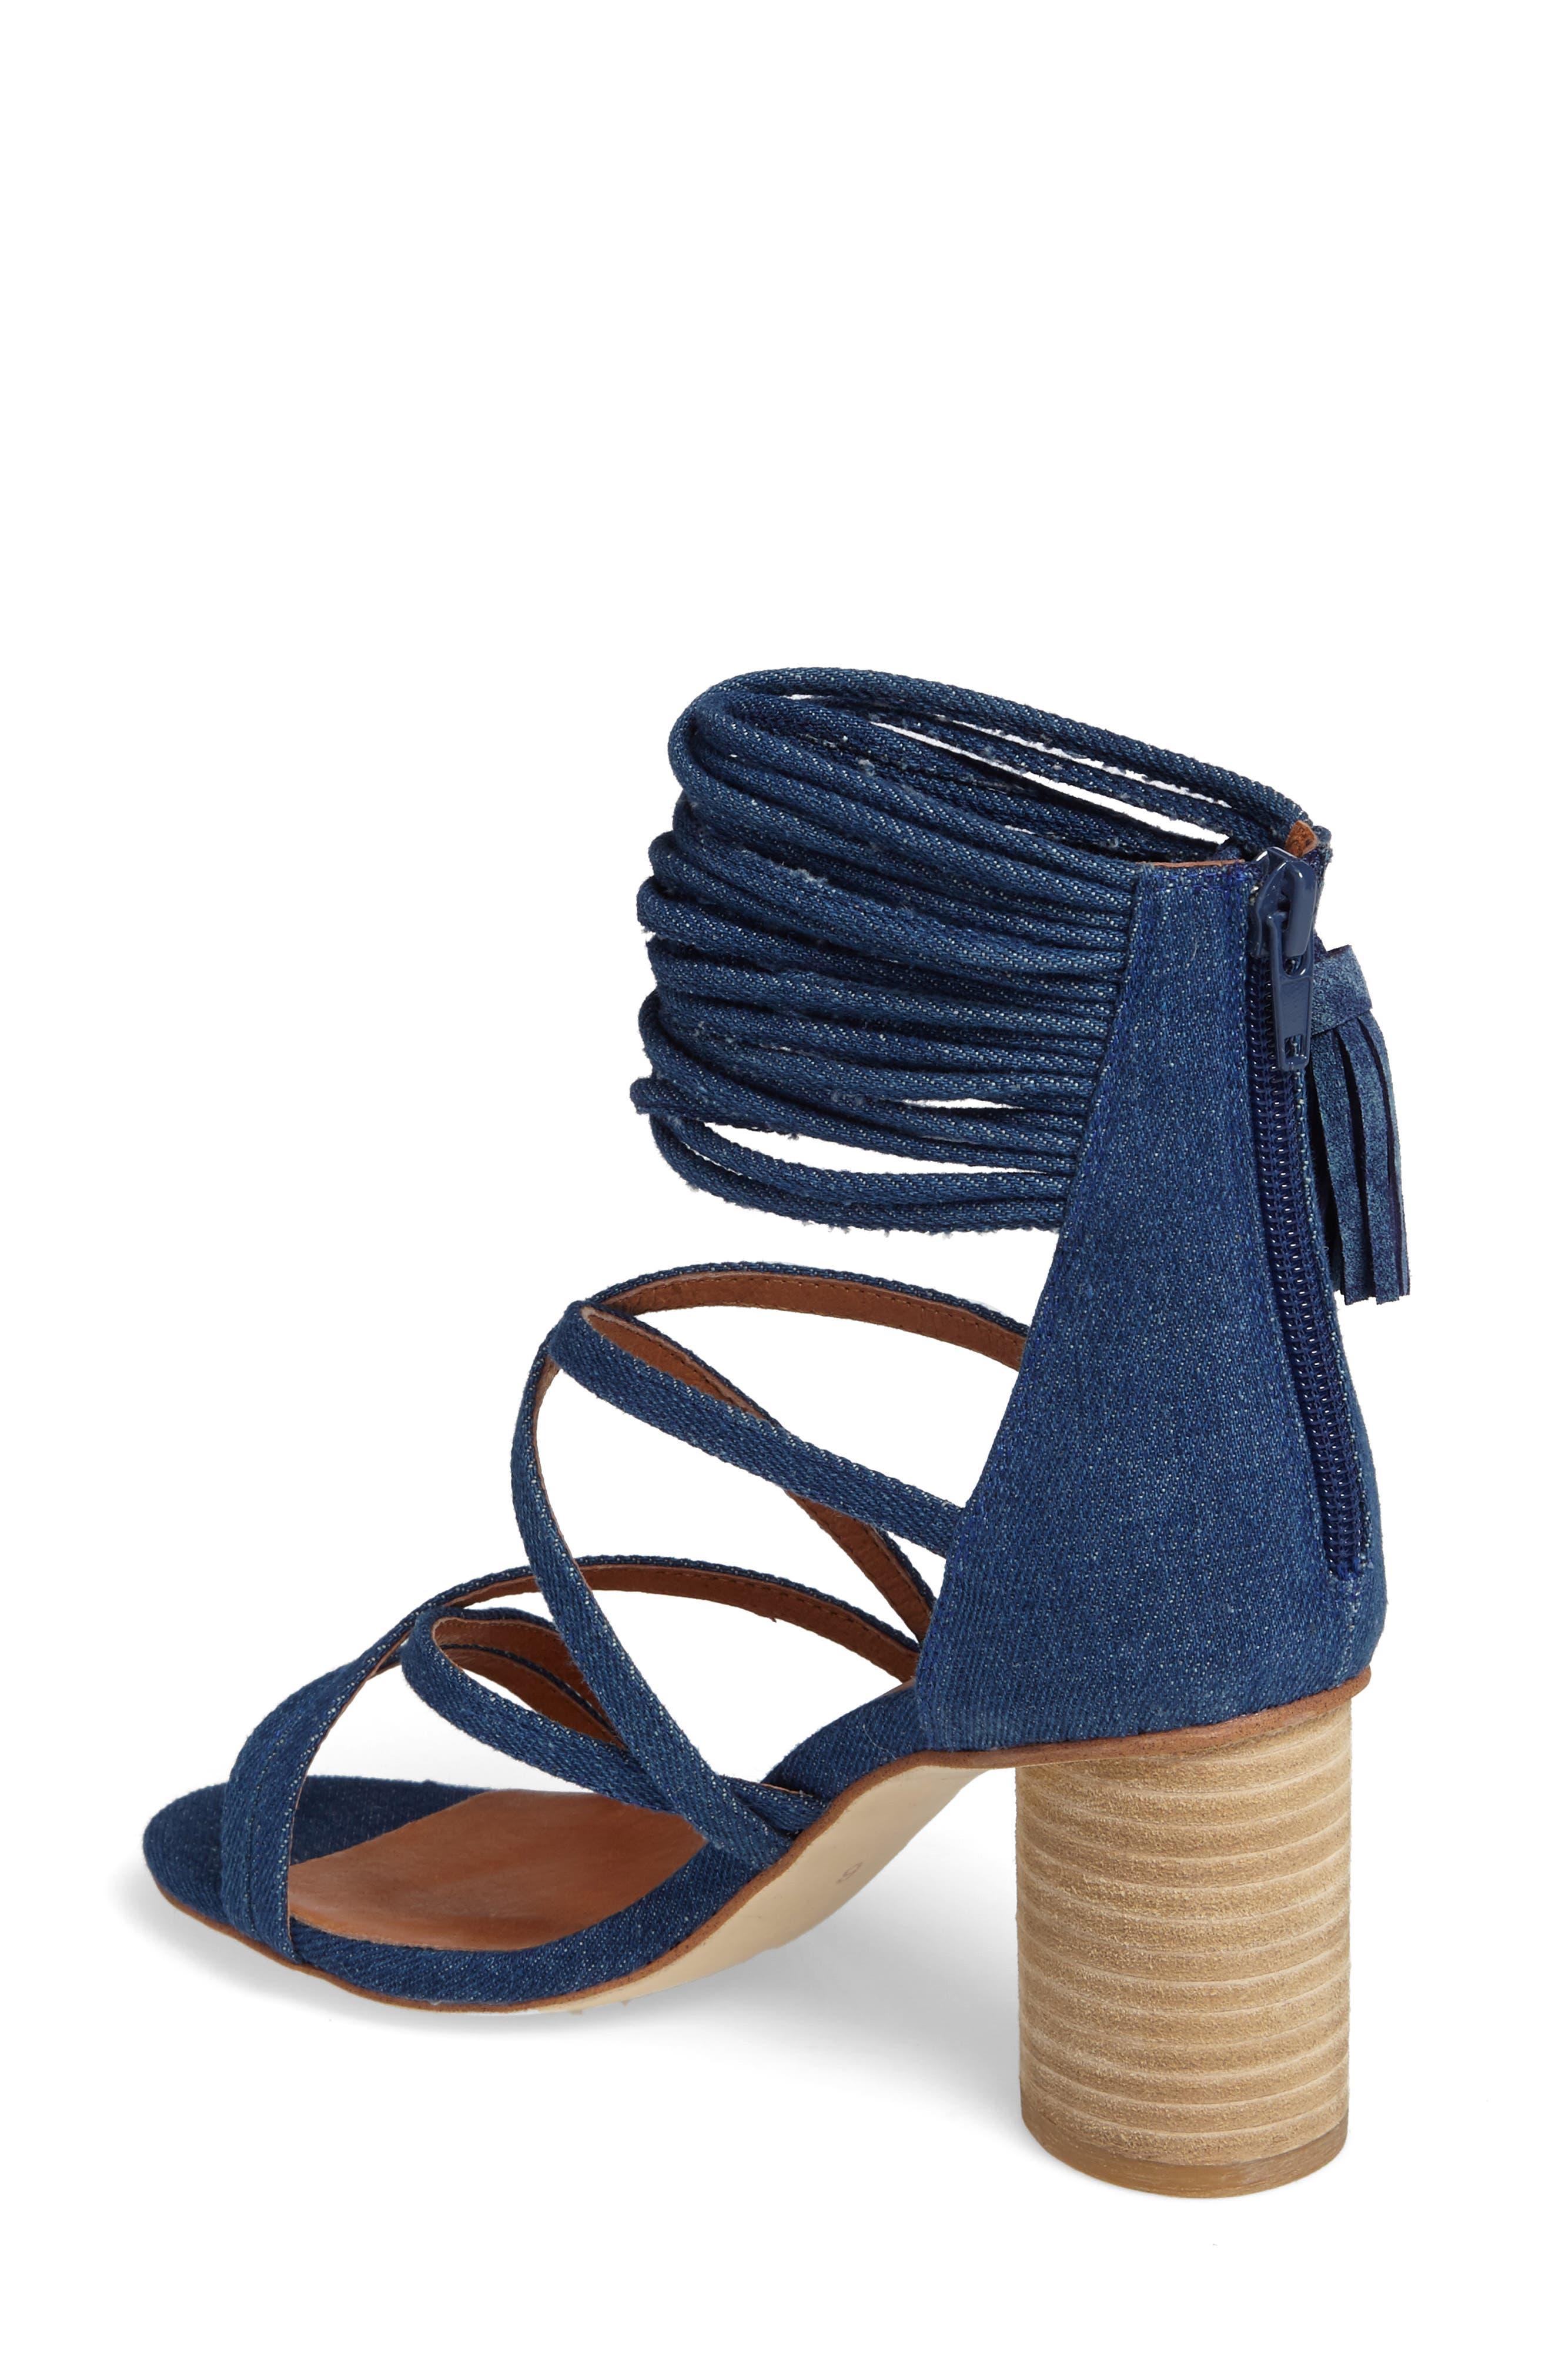 Alternate Image 2  - Jeffrey Campbell 'Despina' Strappy Sandal (Women)